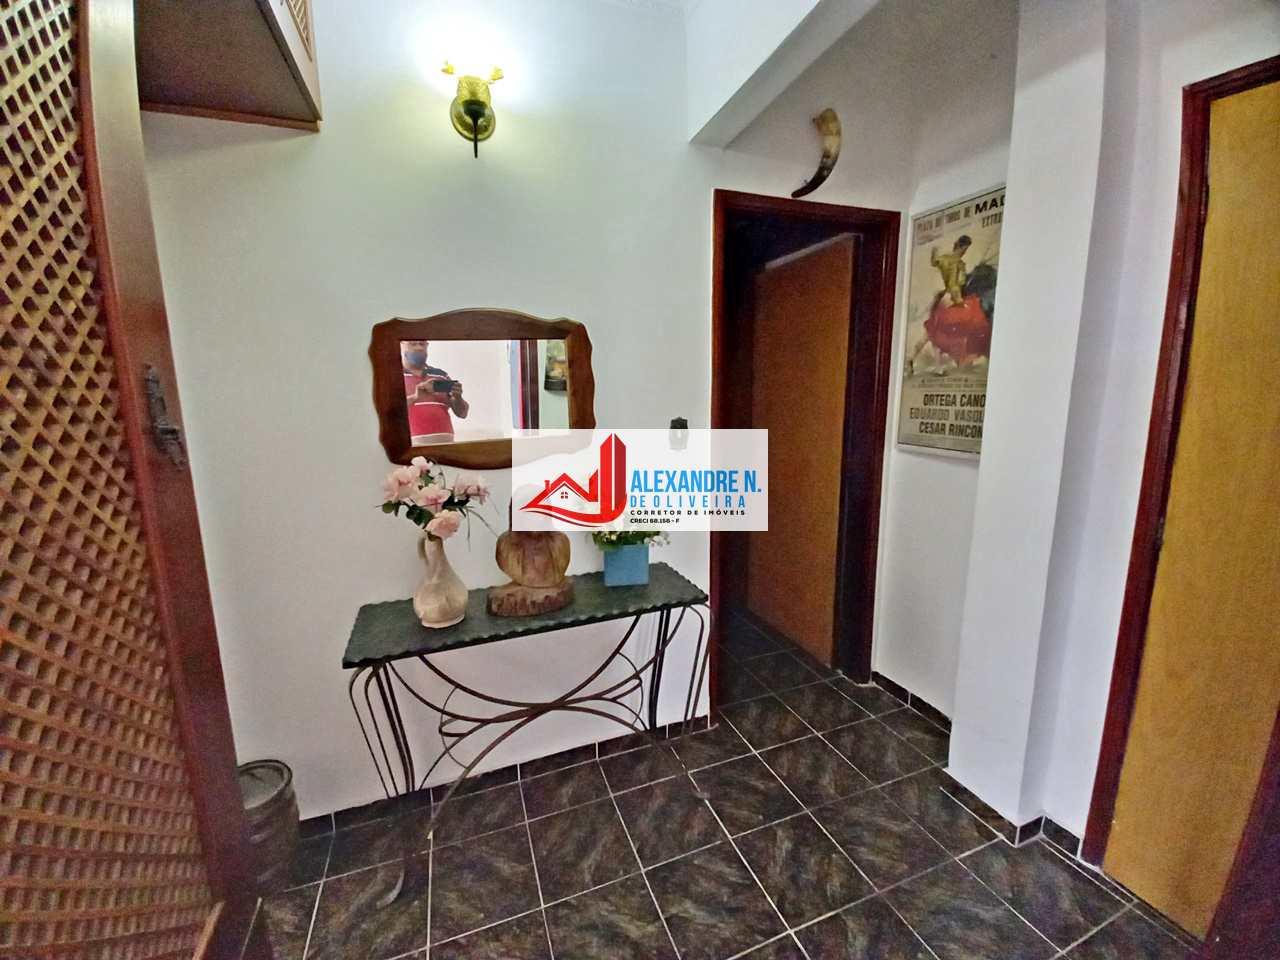 Apartamento 2 dorms, Mirim, Praia Grande, R$ 190 mil, AP00751